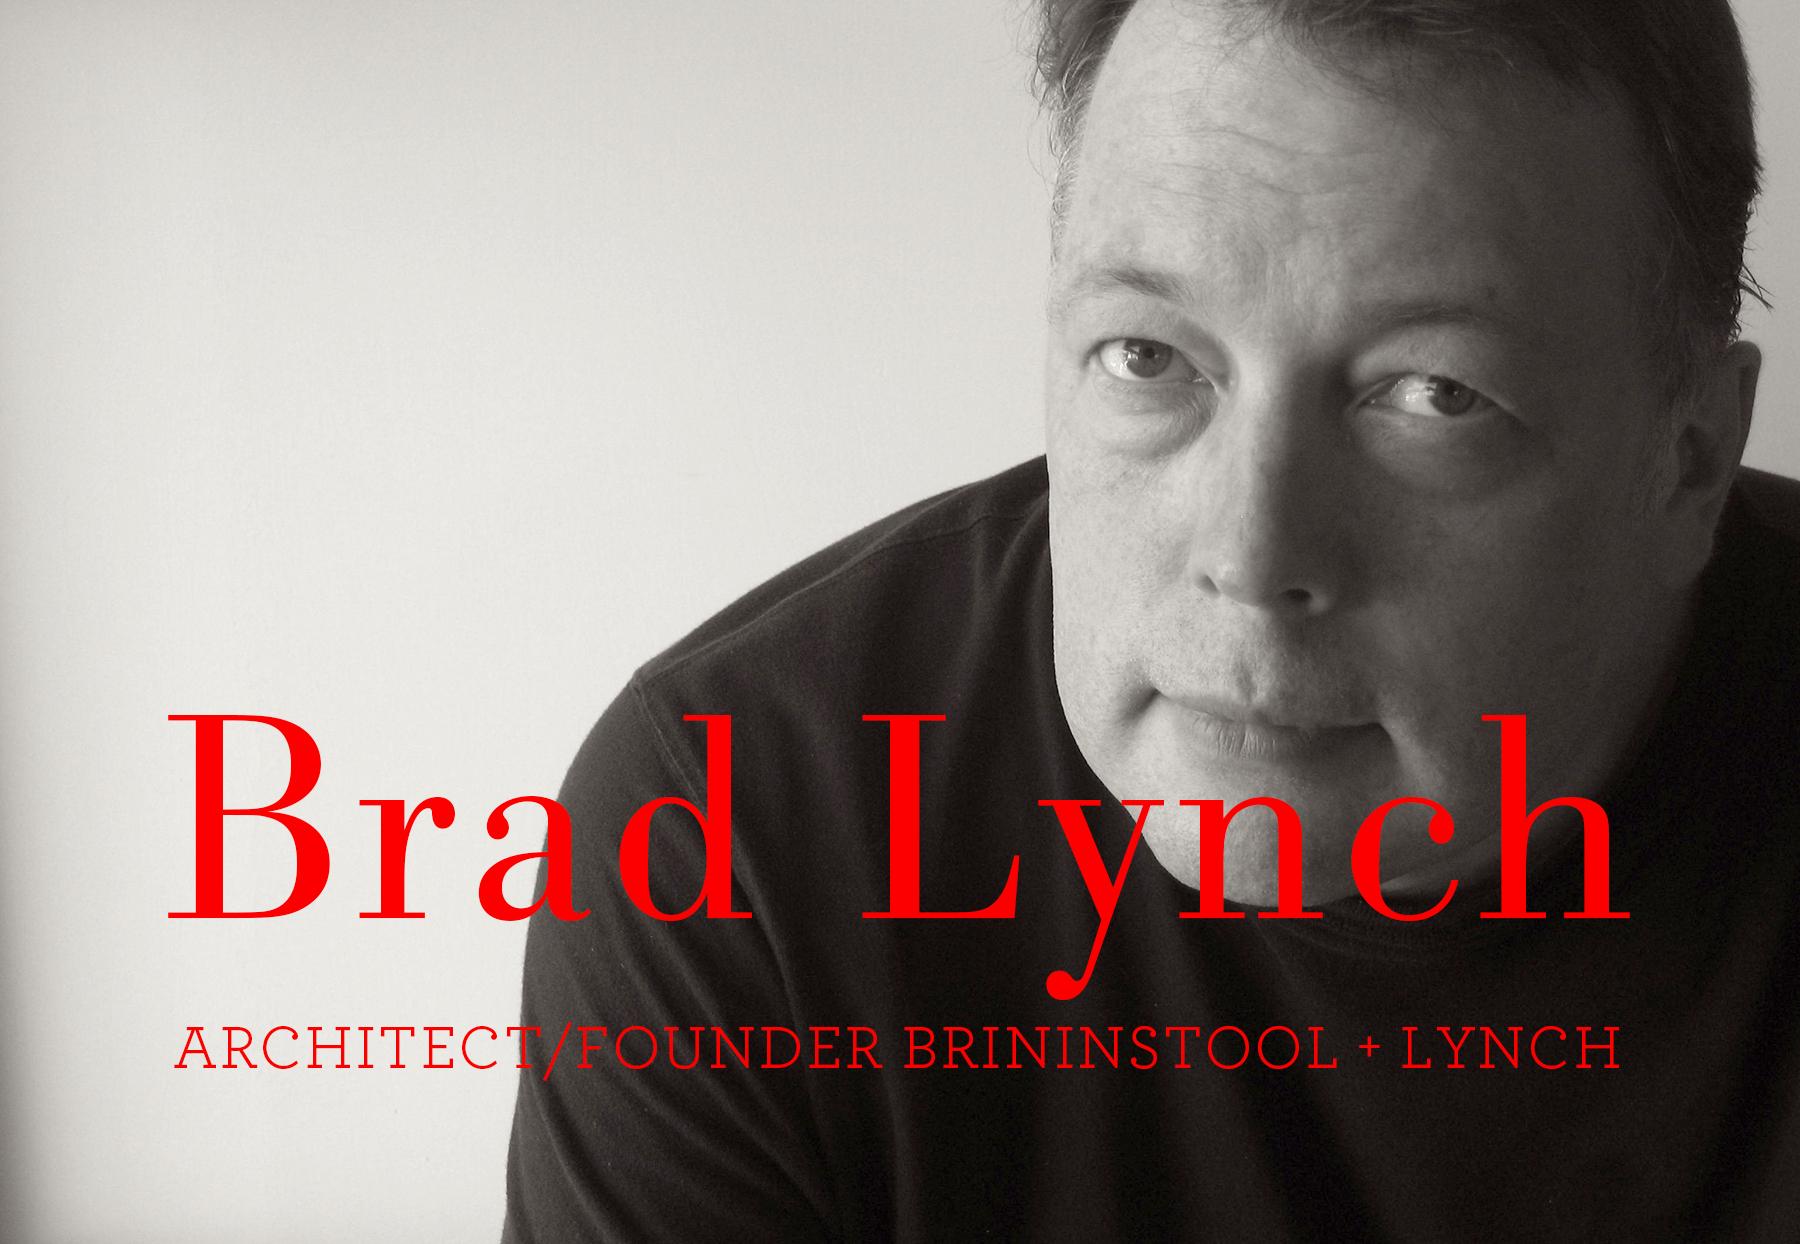 brad lynch name.jpg